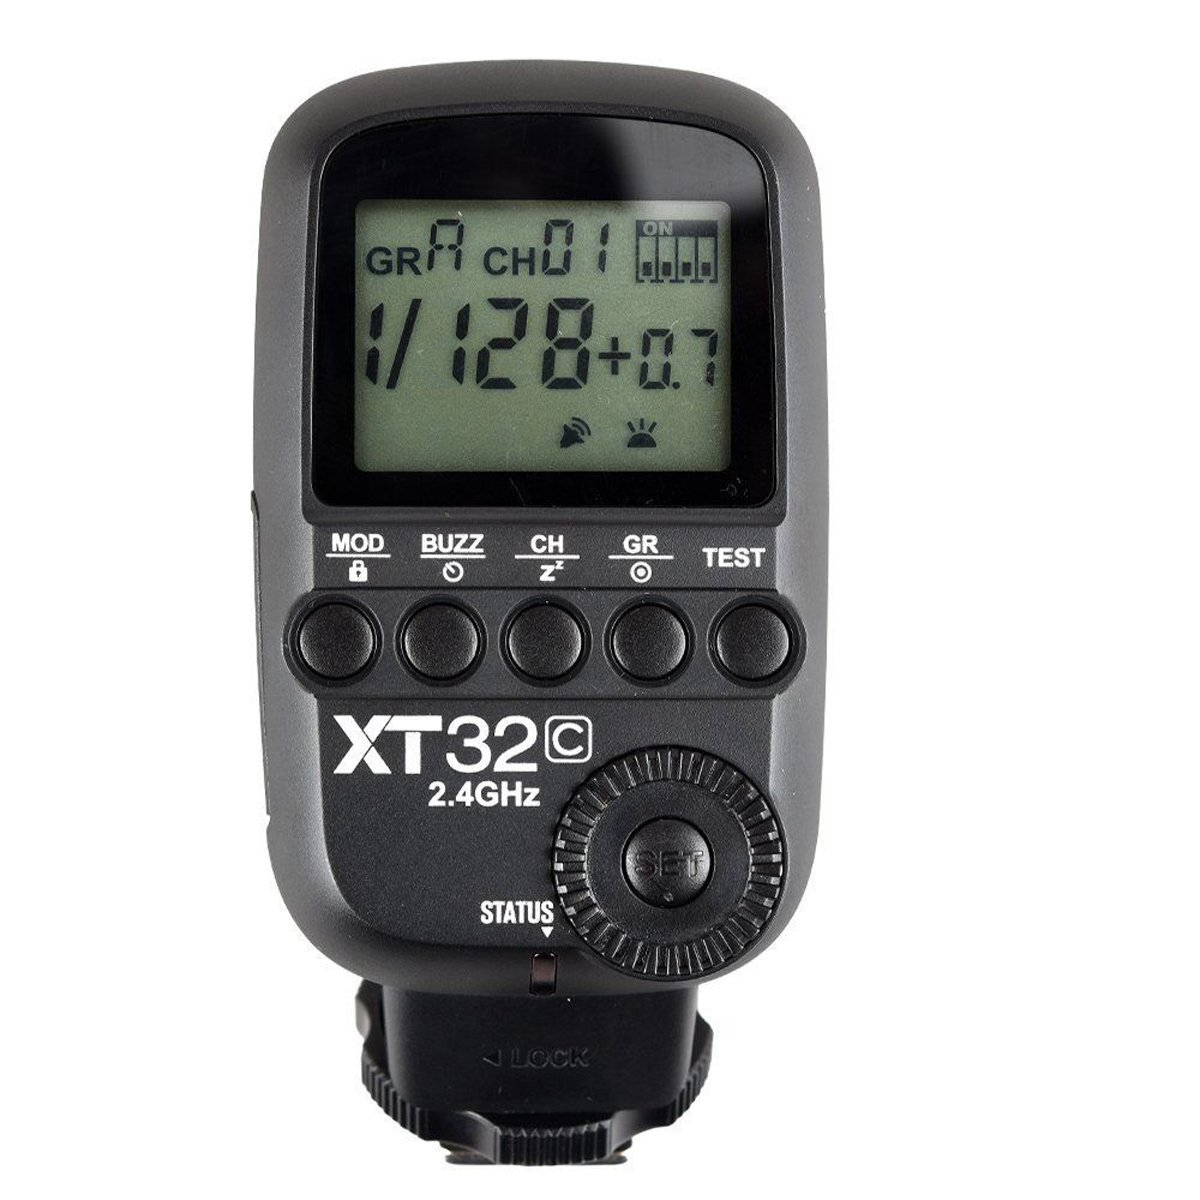 Godox XT32-C 2.4G Wireless Power-Control Flash Trigger, High Speed Sync 1/8000s, 32 Channel 16 Groups for Canon EOS Digital Camera by Godox